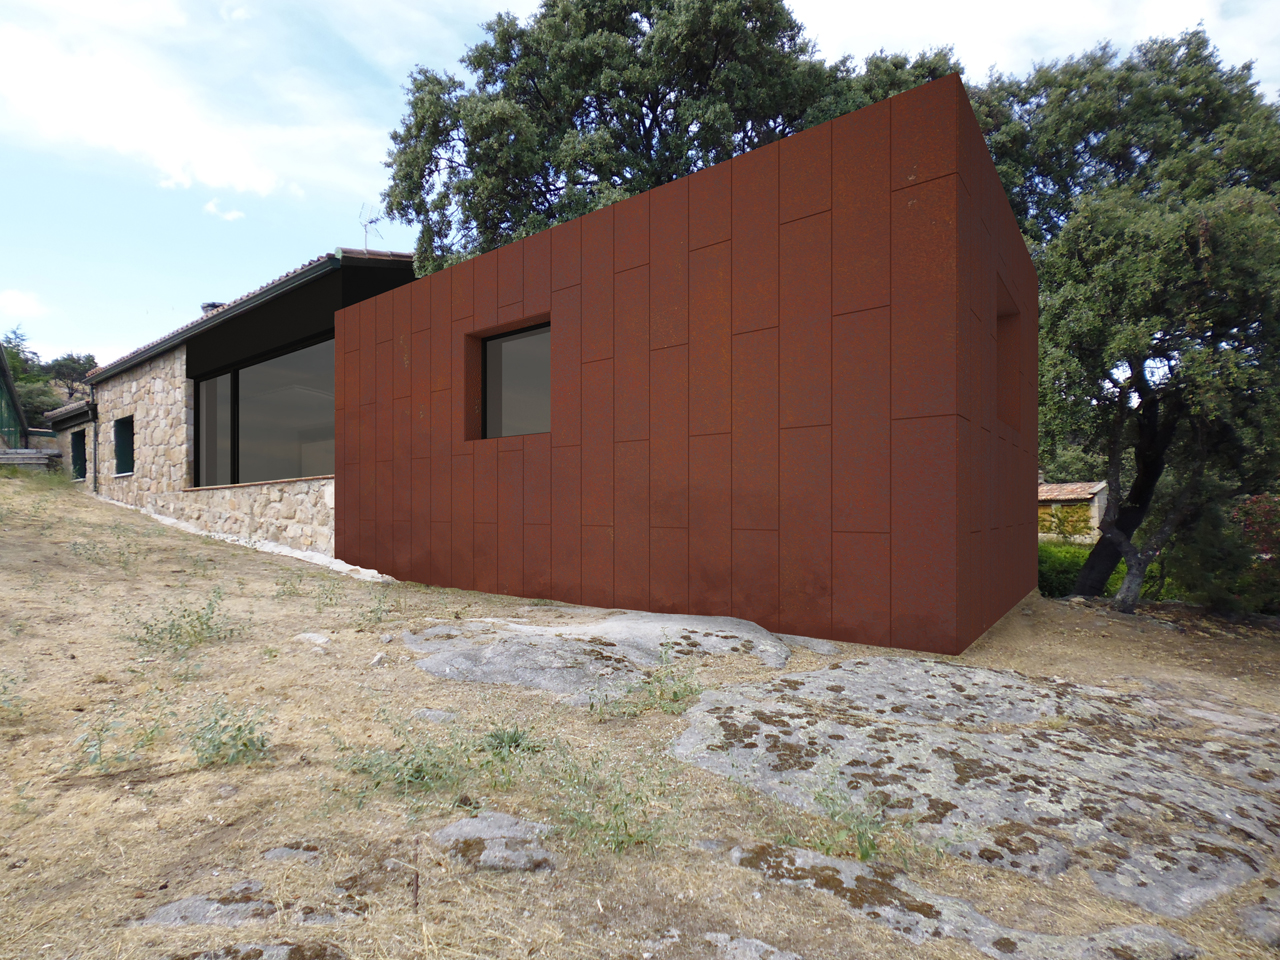 Ampliaci n vivienda unifamiliar en valdemorillo - Acero corten fachadas ...